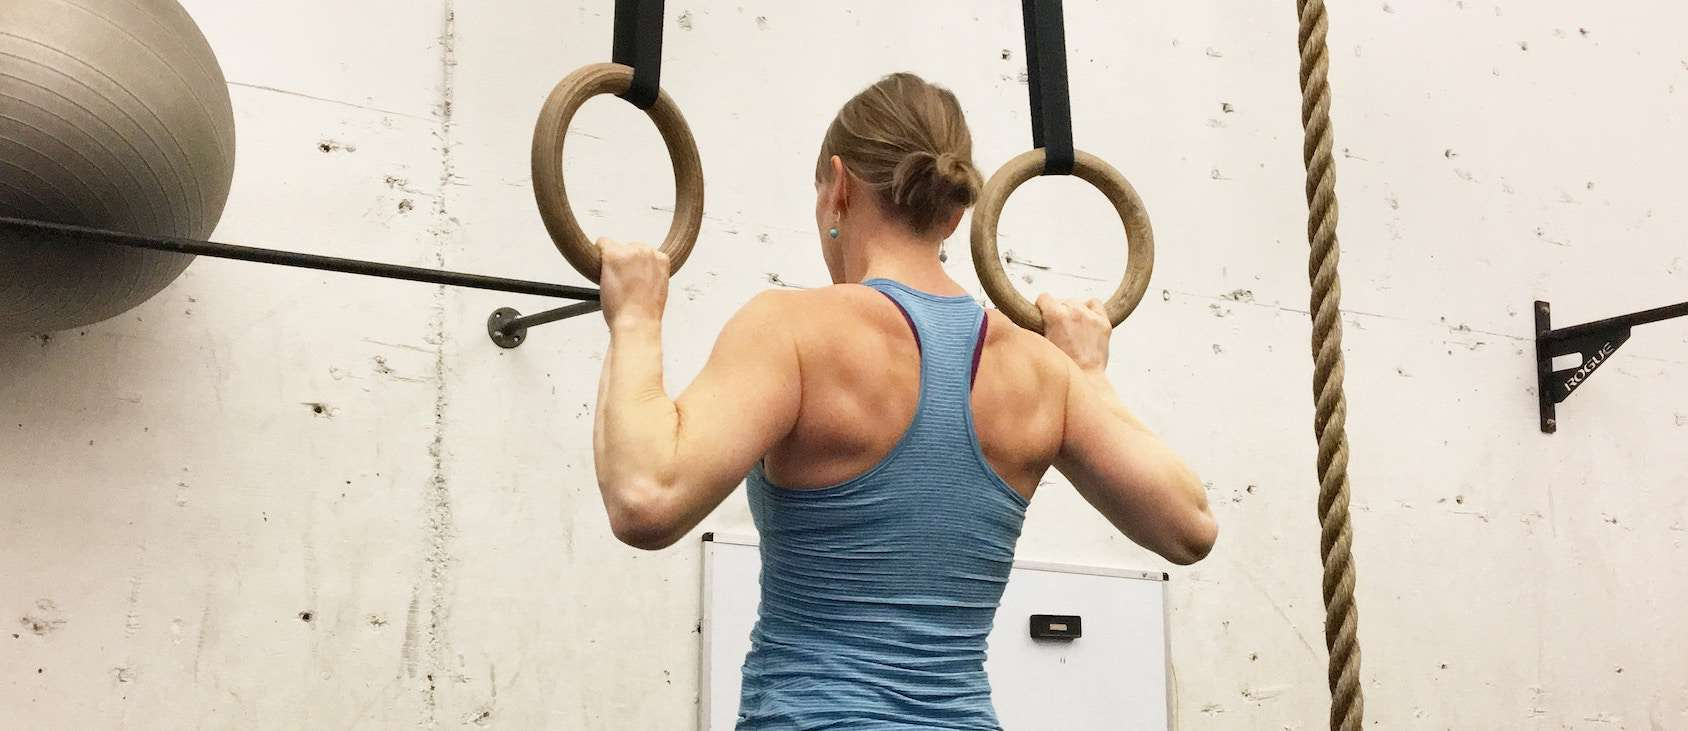 Why Every Exercise Program Needs Strength Training